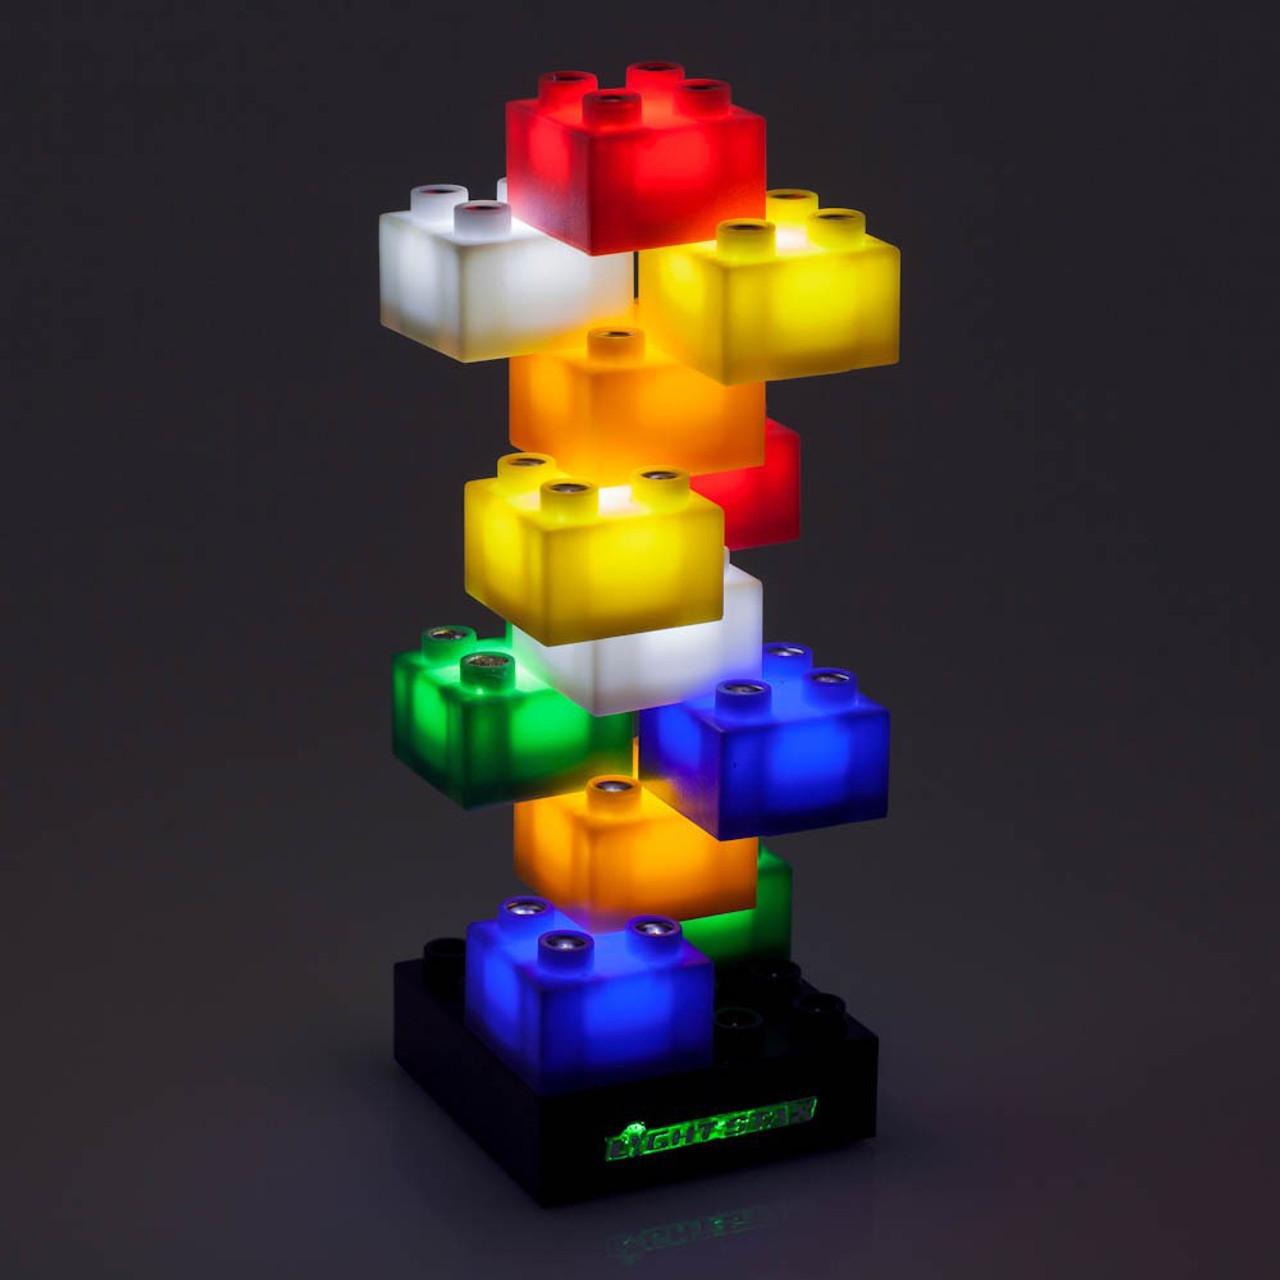 LIGHT STAX Illuminated Blocks Mega Set 102 Pc